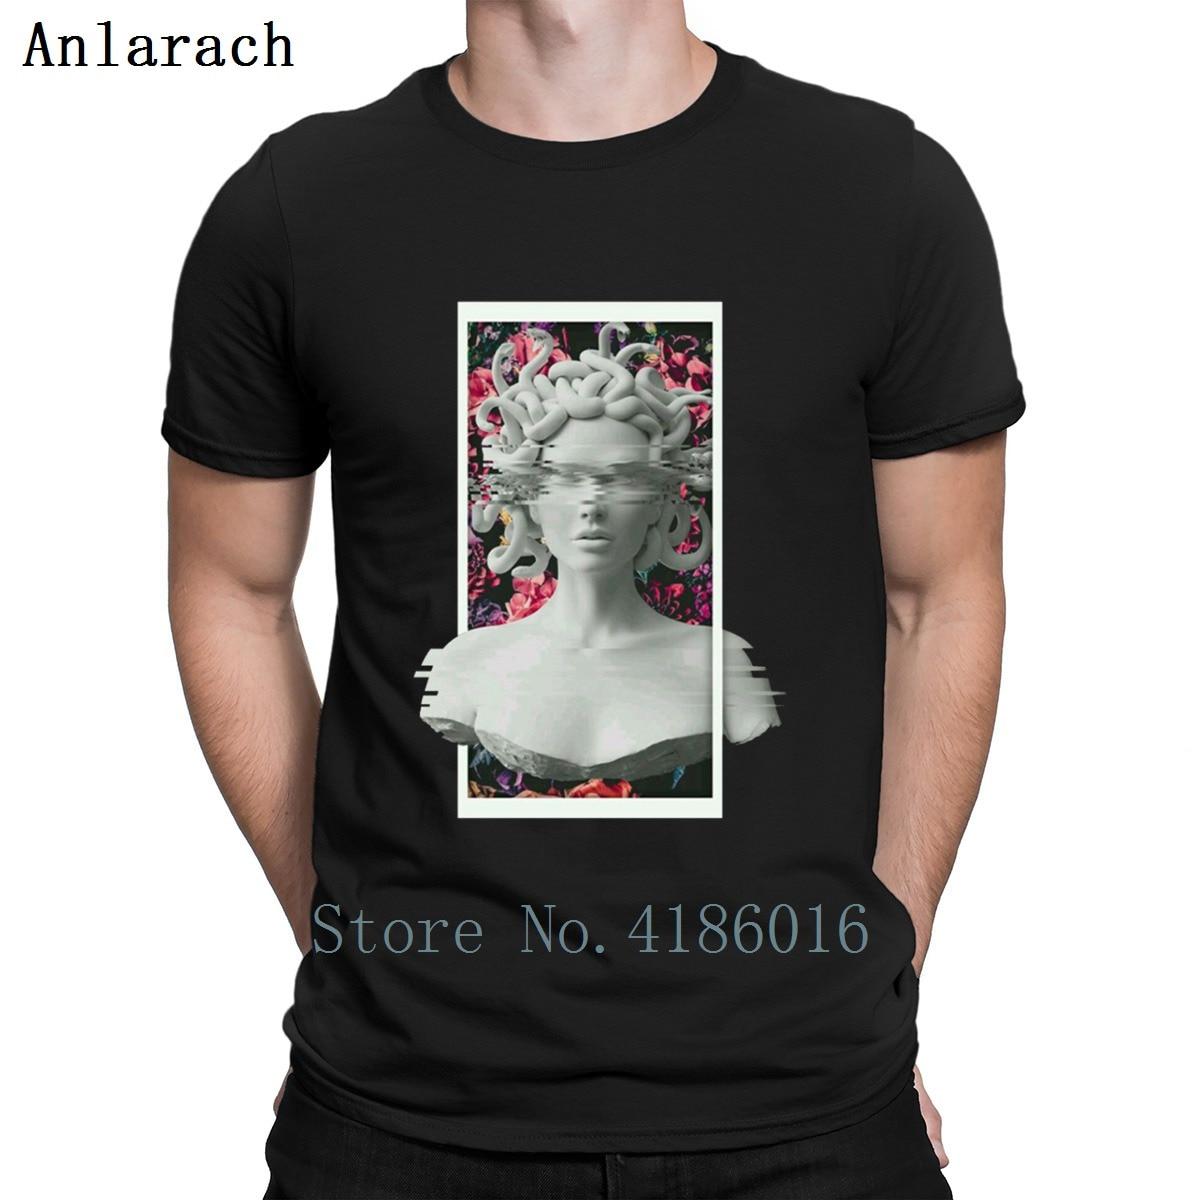 Medusa T Shirt Summer Top New Fashion Interesting Designs Mens Tee Shirts S-3xl Kawaii Stylish Spring Autumn